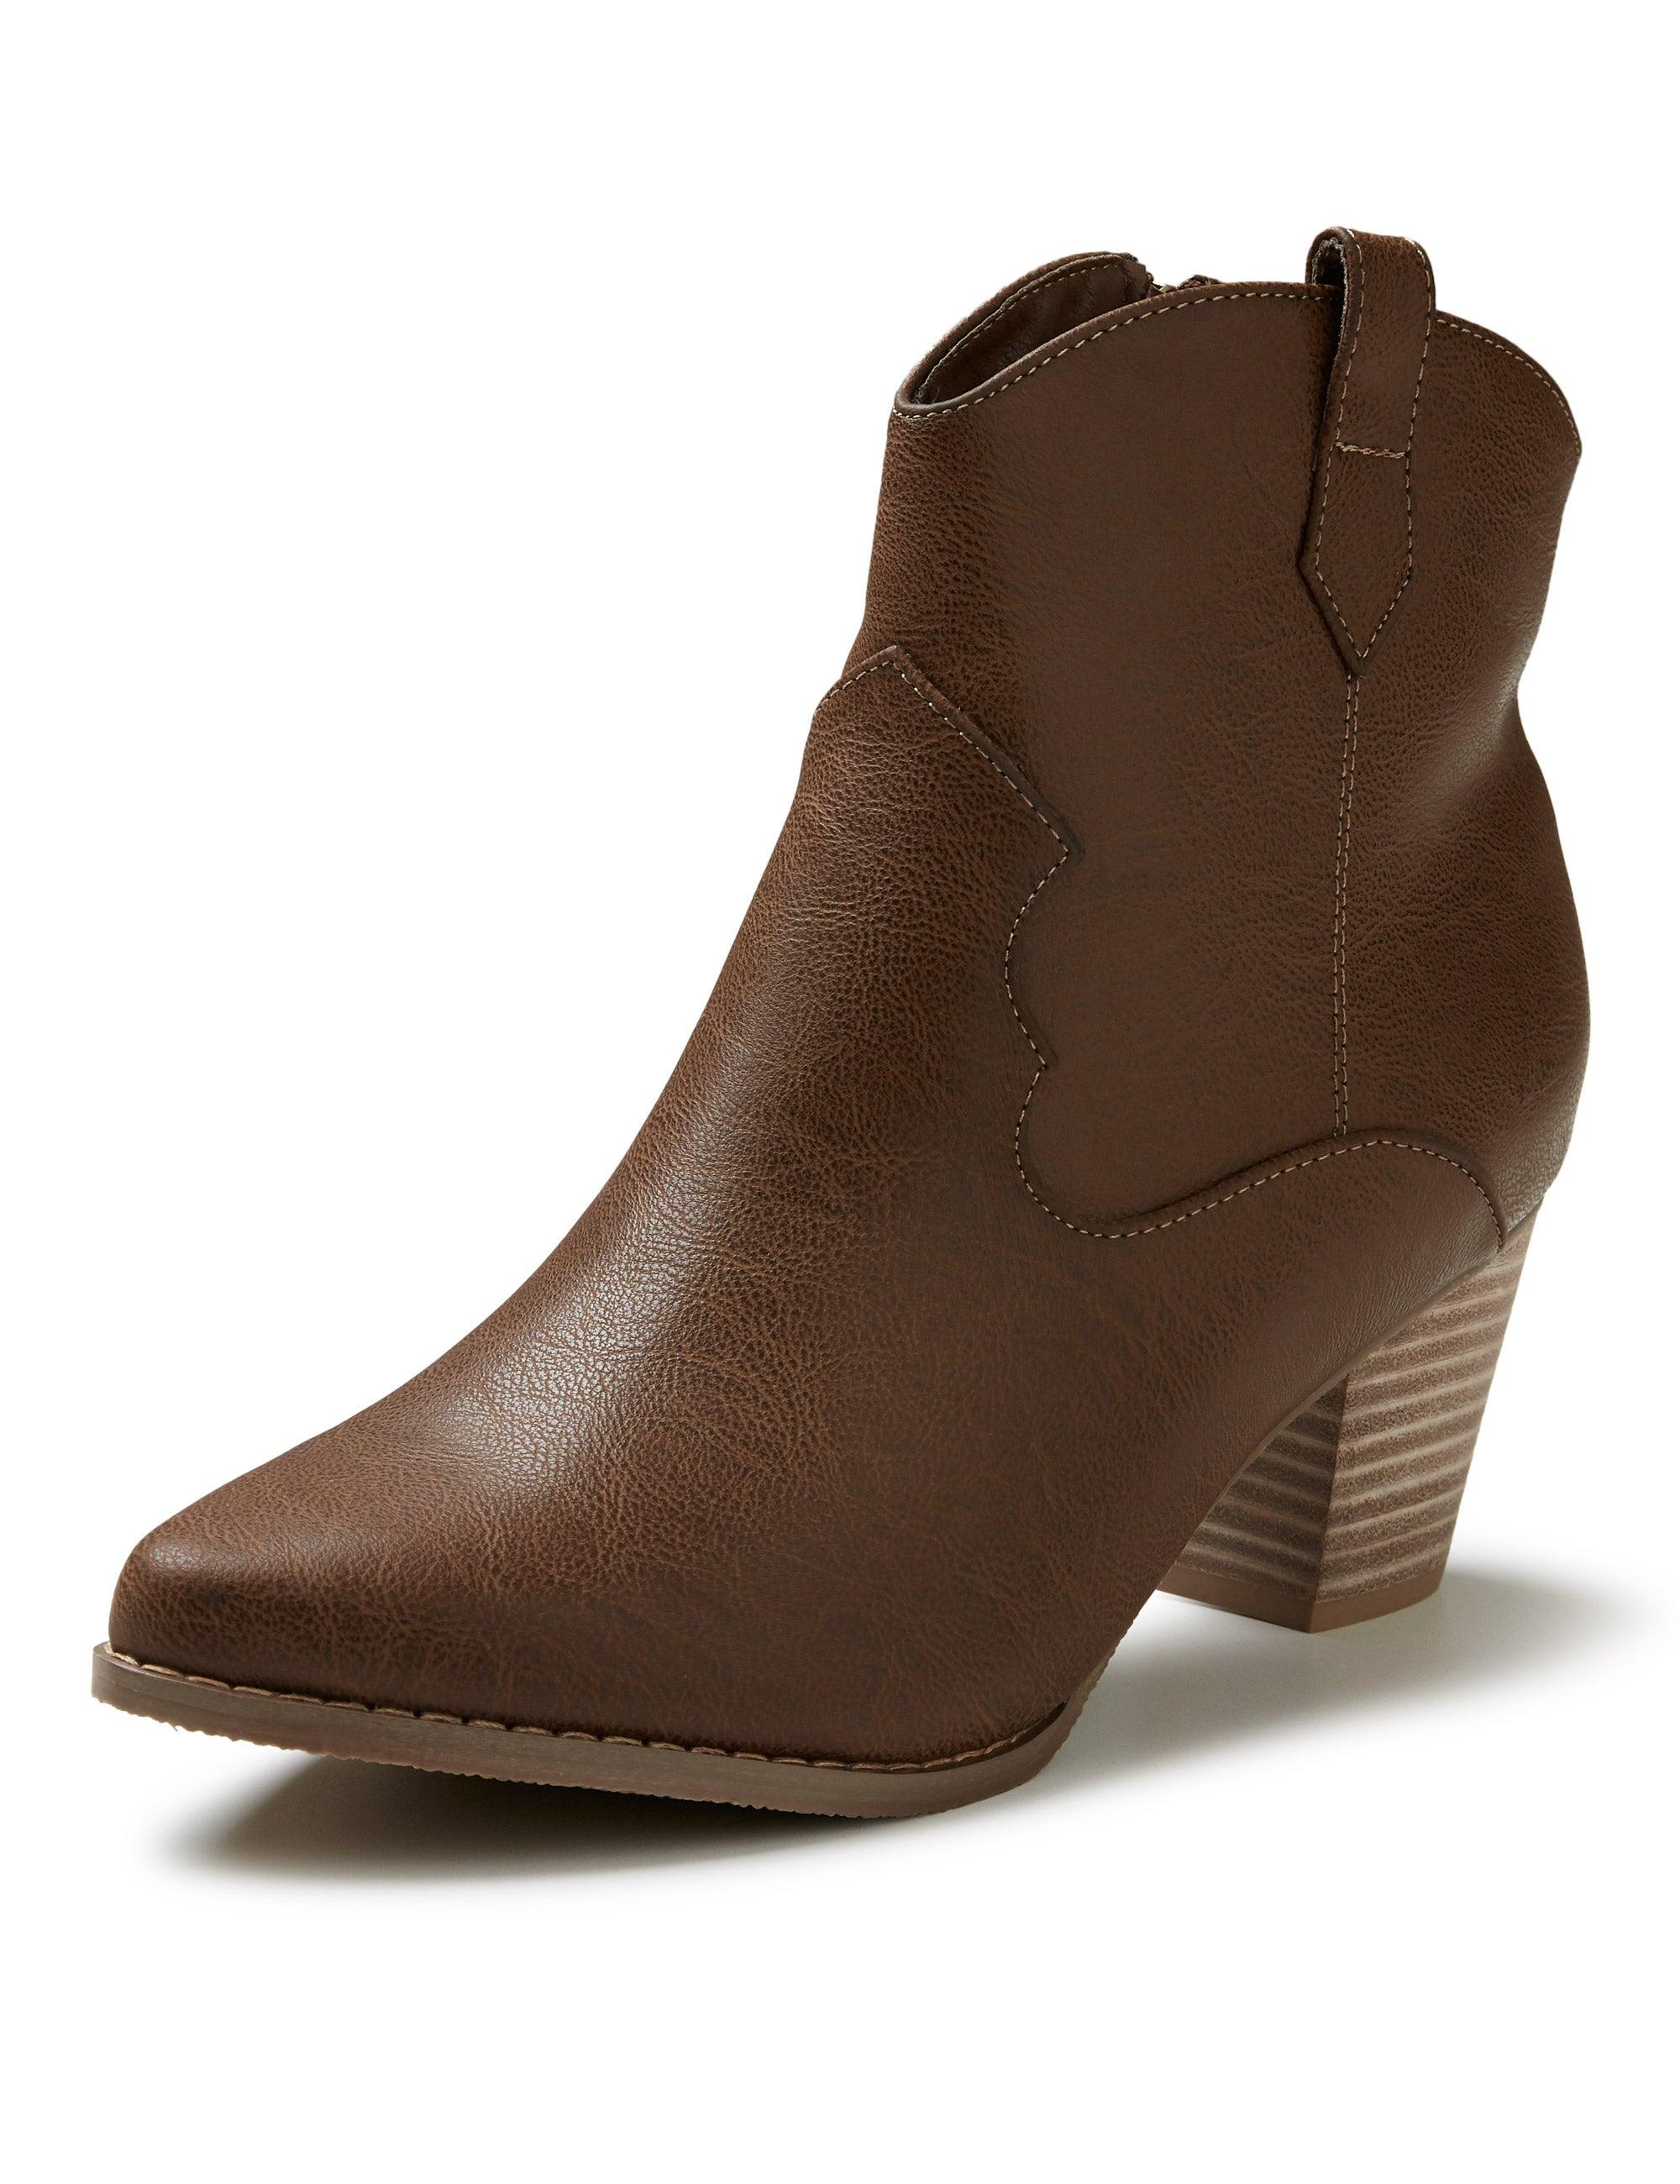 Women Footwear : Online sales Boots,Slippers,Clothing,Vests